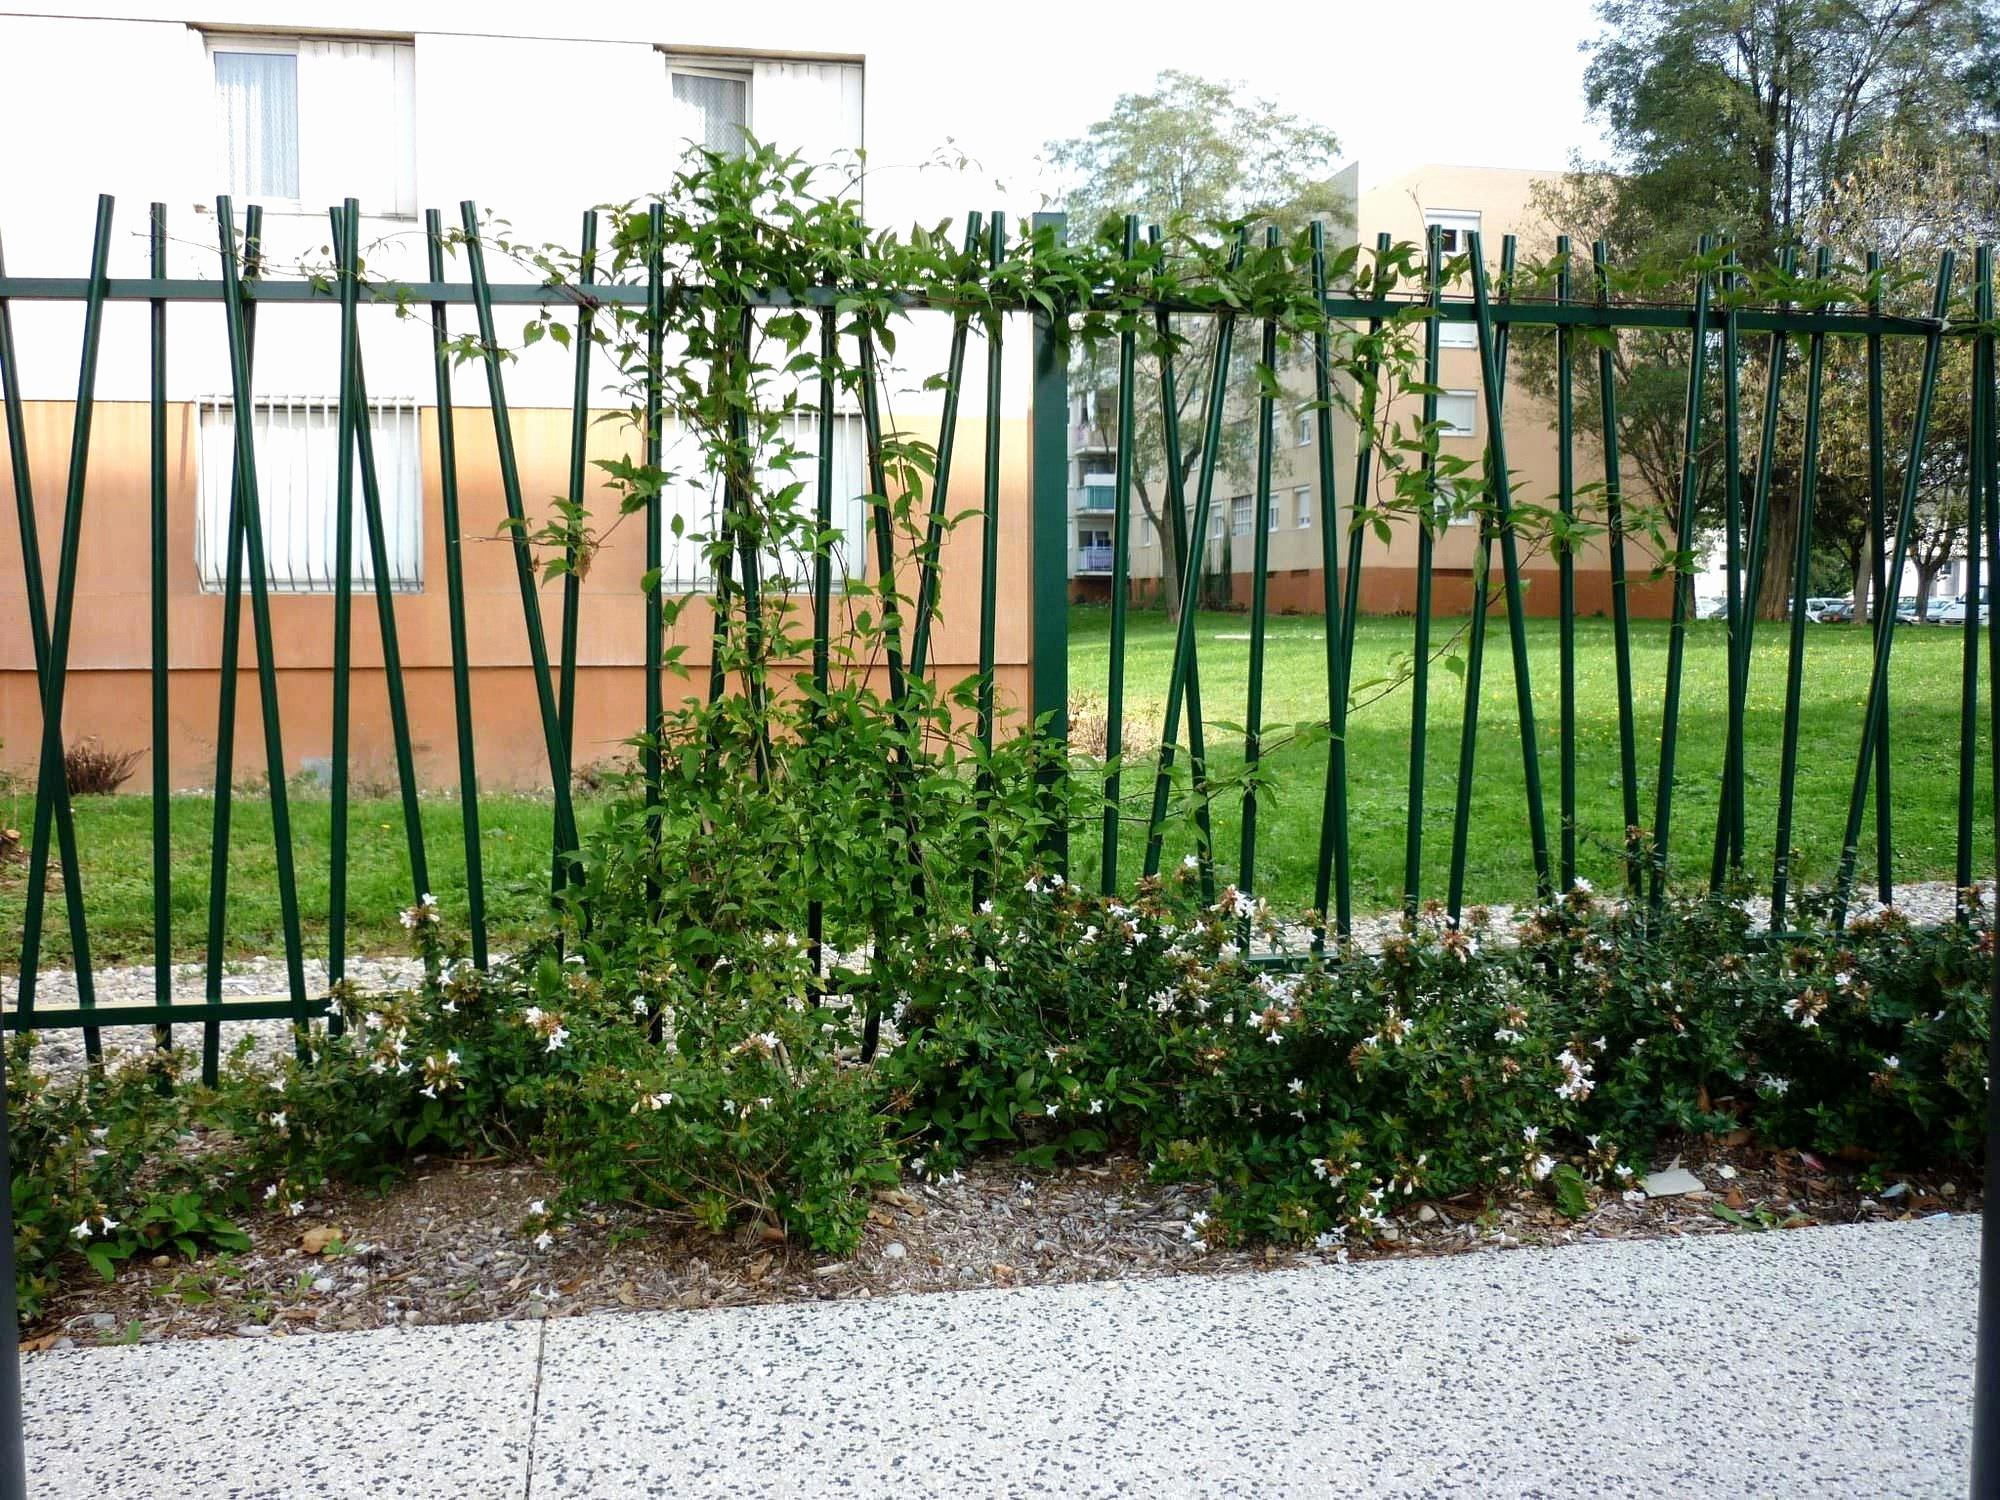 Palis Ardoise Brico Depot Gamboahinestrosa Serapportanta Dalle Ardoise Jardin Castorama Idees Conception Jardin Idees Conception Jardin